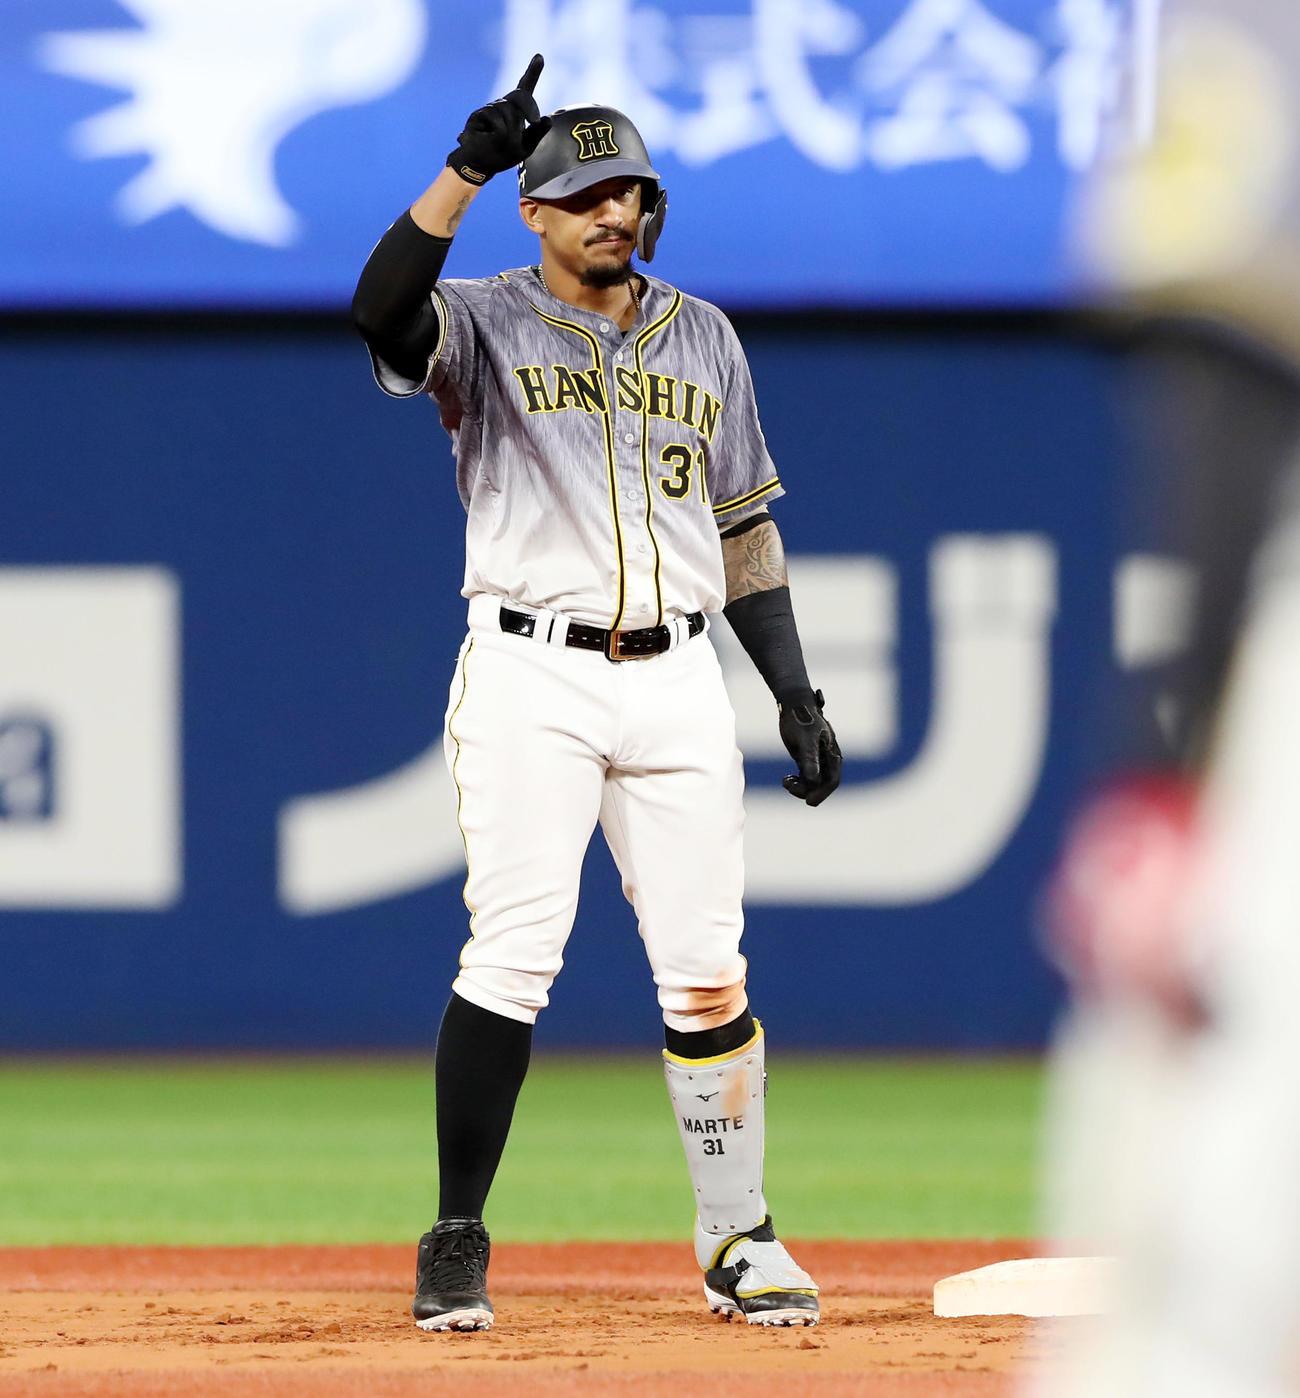 DeNA対阪神 5回表阪神1死一、二塁、マルテは左越え適時二塁打を放ちベンチにポーズ(撮影・加藤哉)